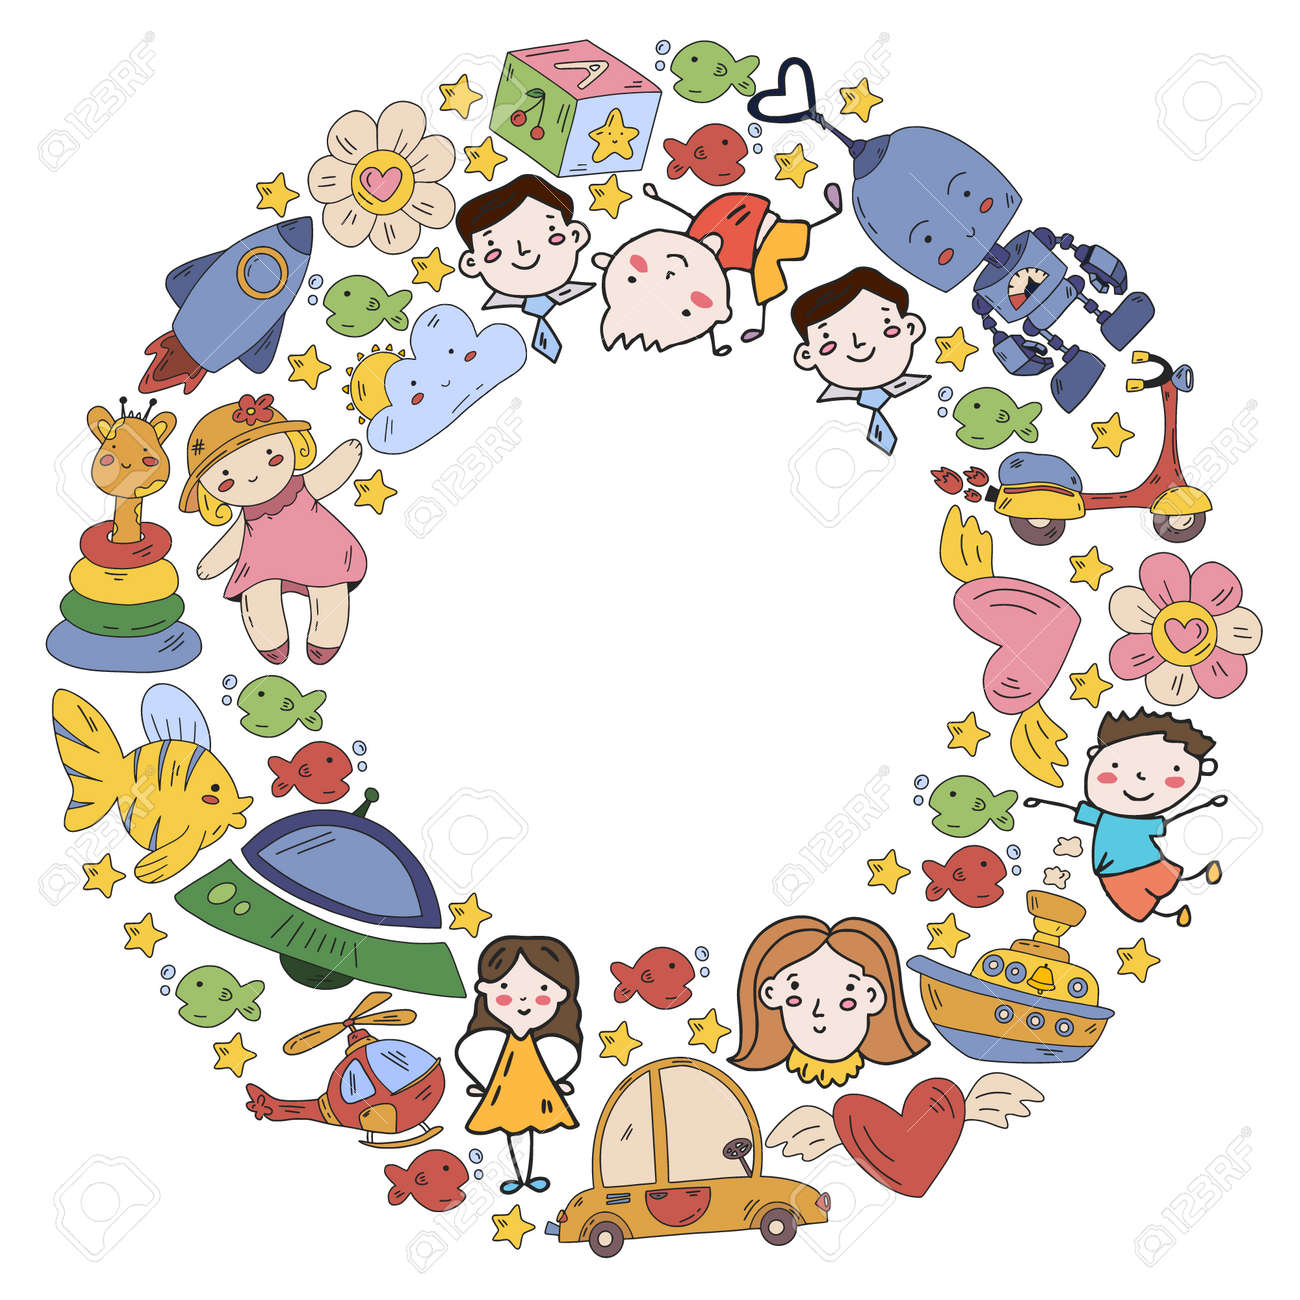 Children play with toys in the kindergarten. Kids playground. Education, creativity, imagination. - 173213211